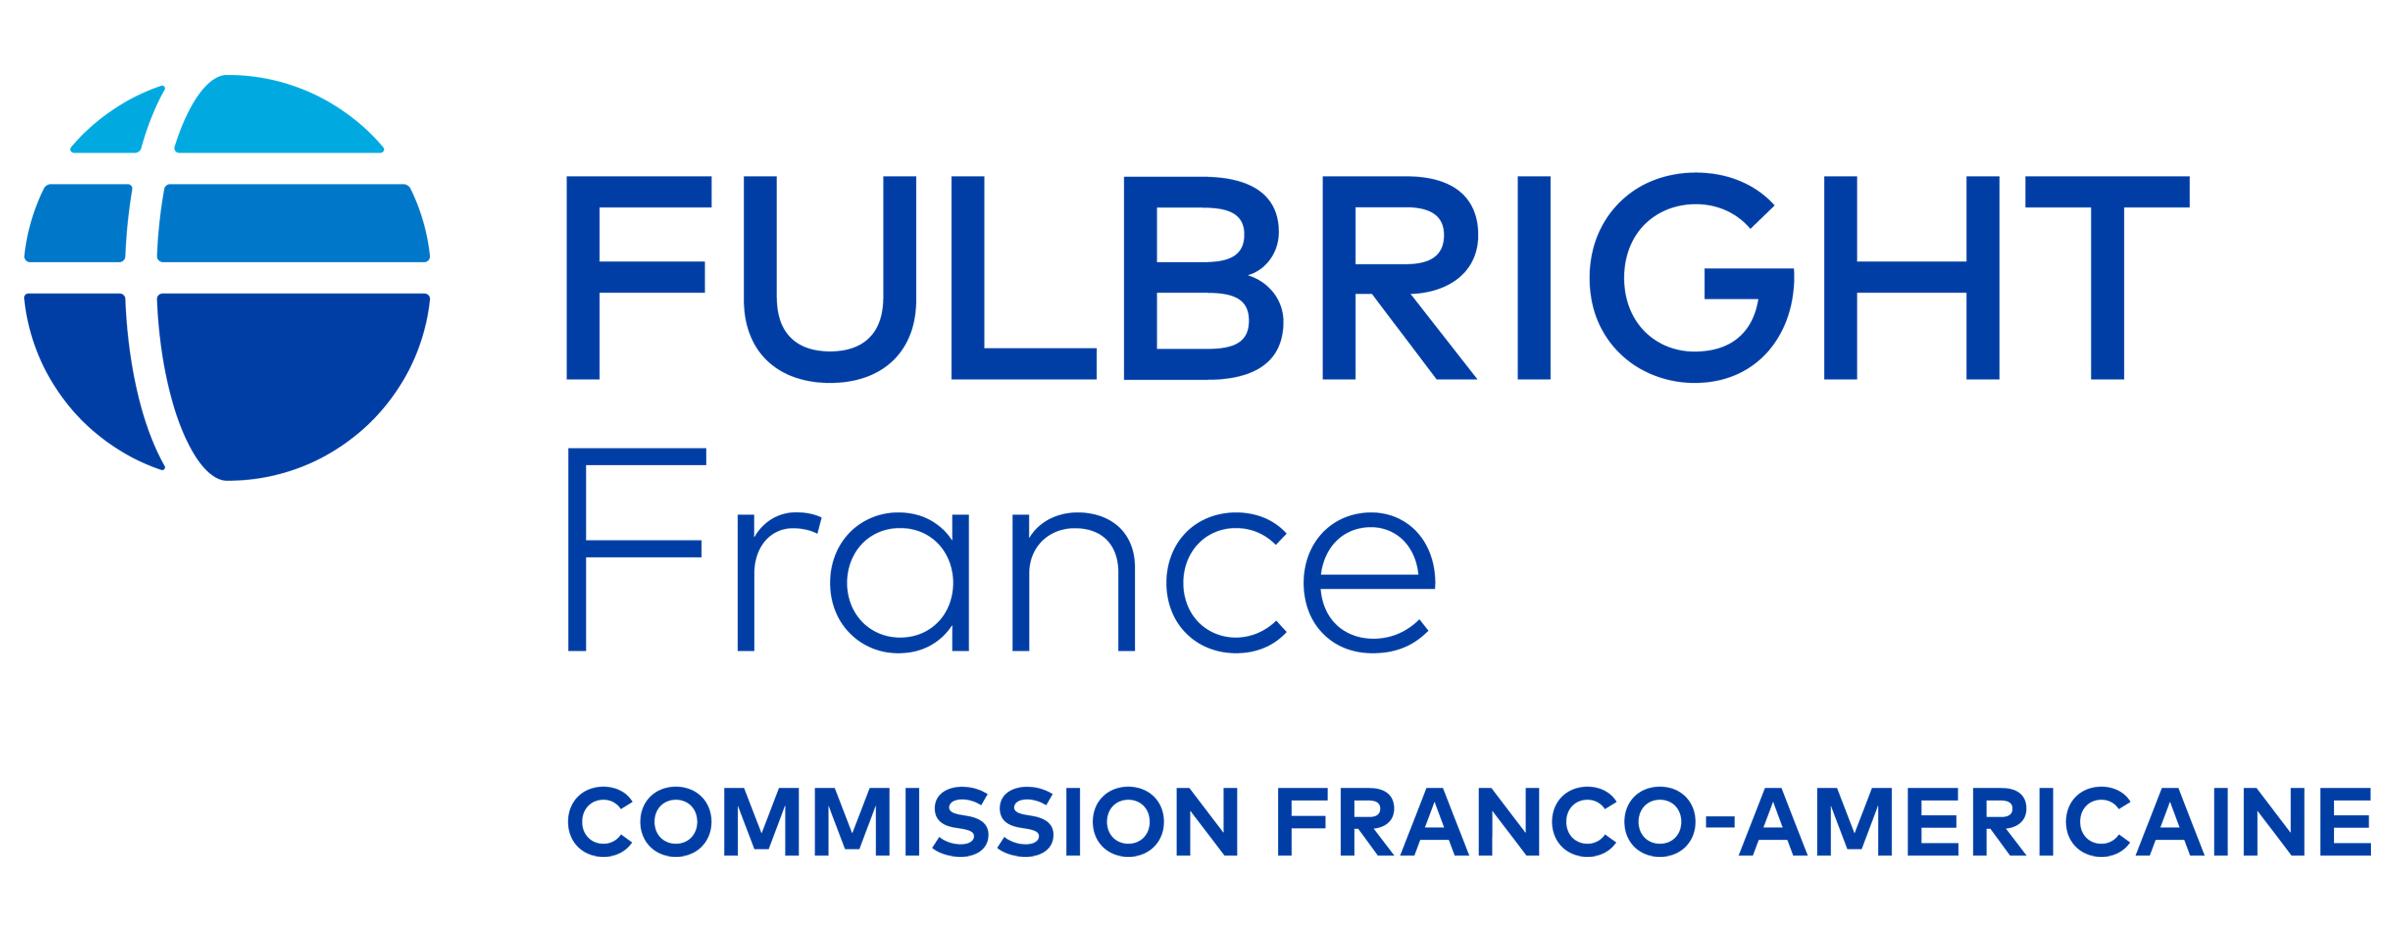 Commission franco-américaine Fullbright